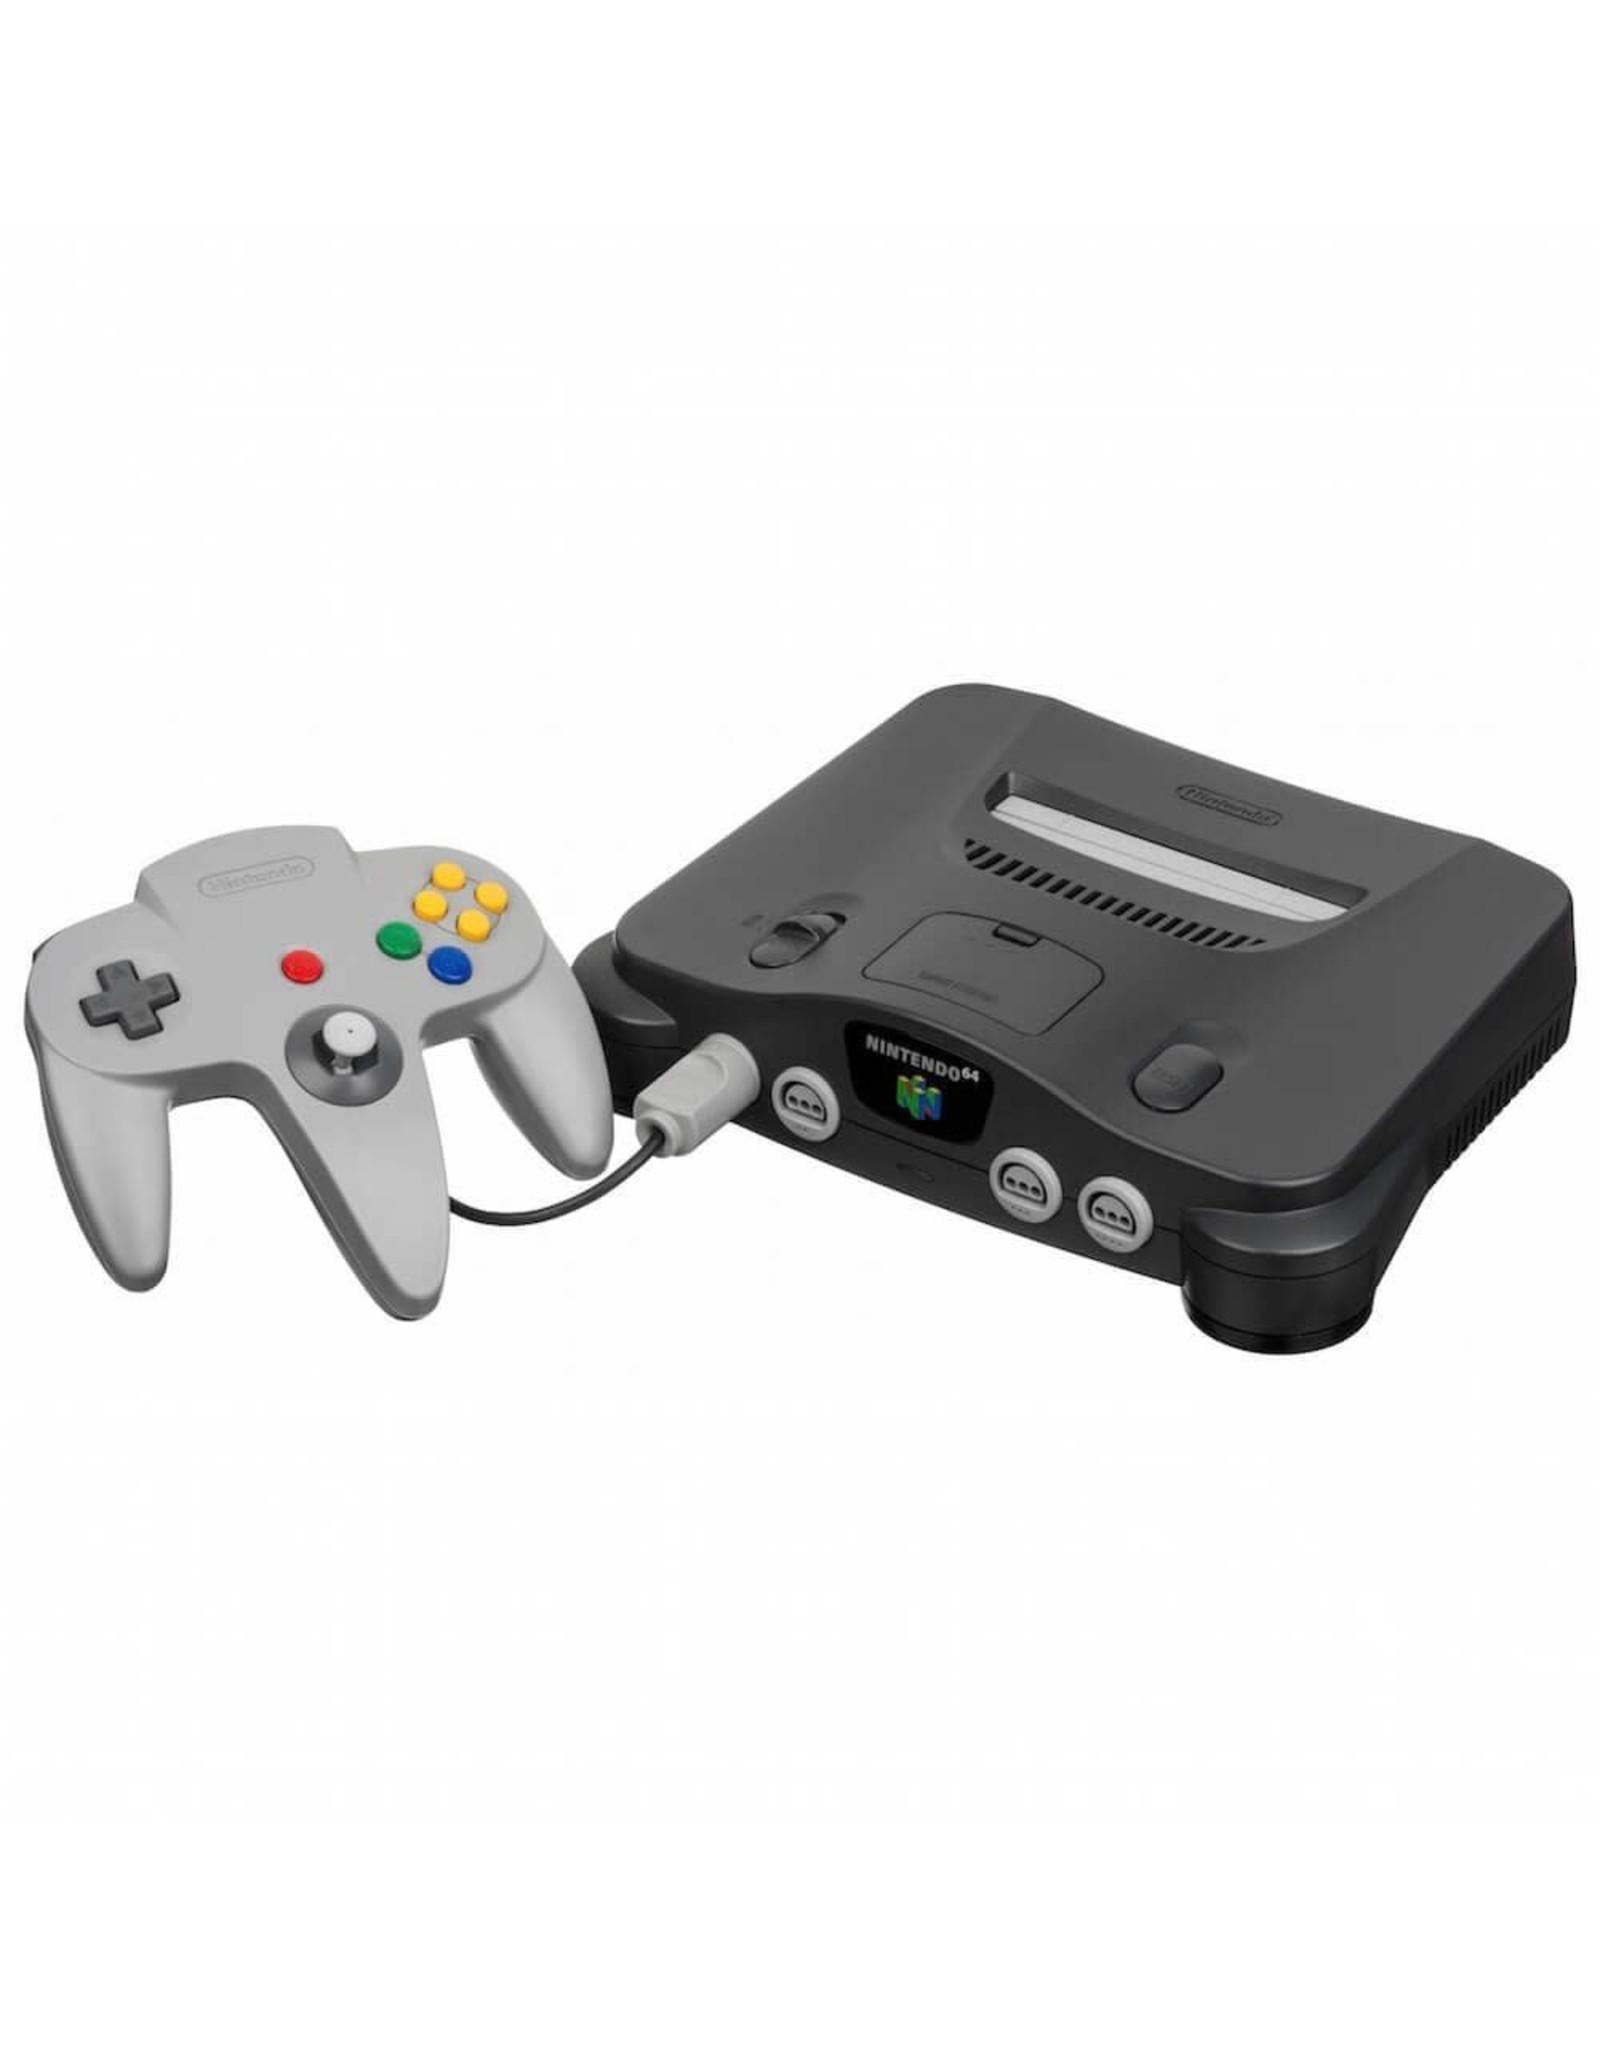 Nintendo Nintendo 64 Console Gray (N64) - USED